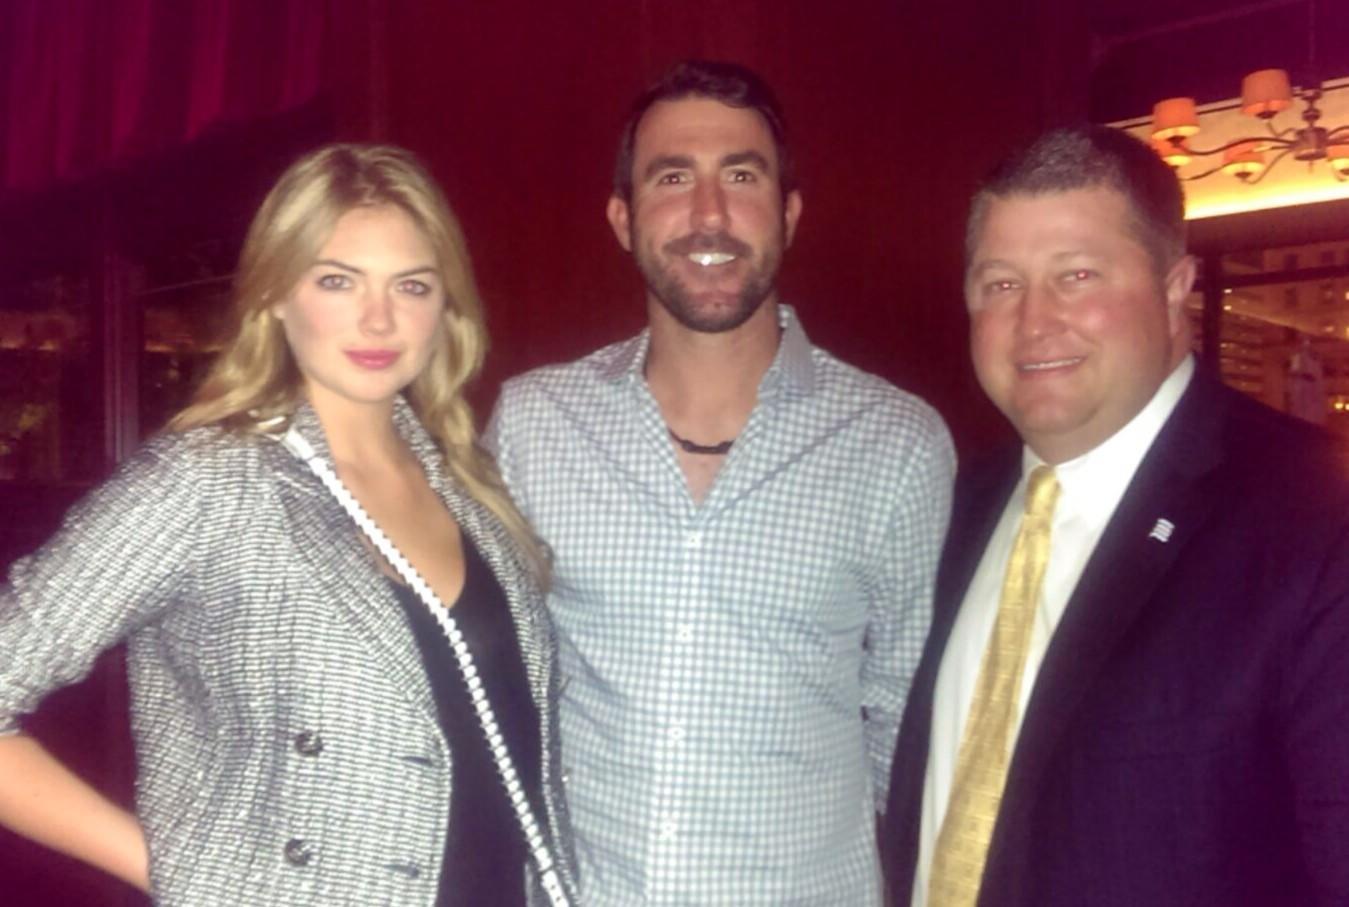 Model Kate Upton (left) and the Detroit Tigers' Justin Verlander (center) at Chicago Cut Steakhouse June 10, 2014 with Chicago Cut managing partner David Flom (right).